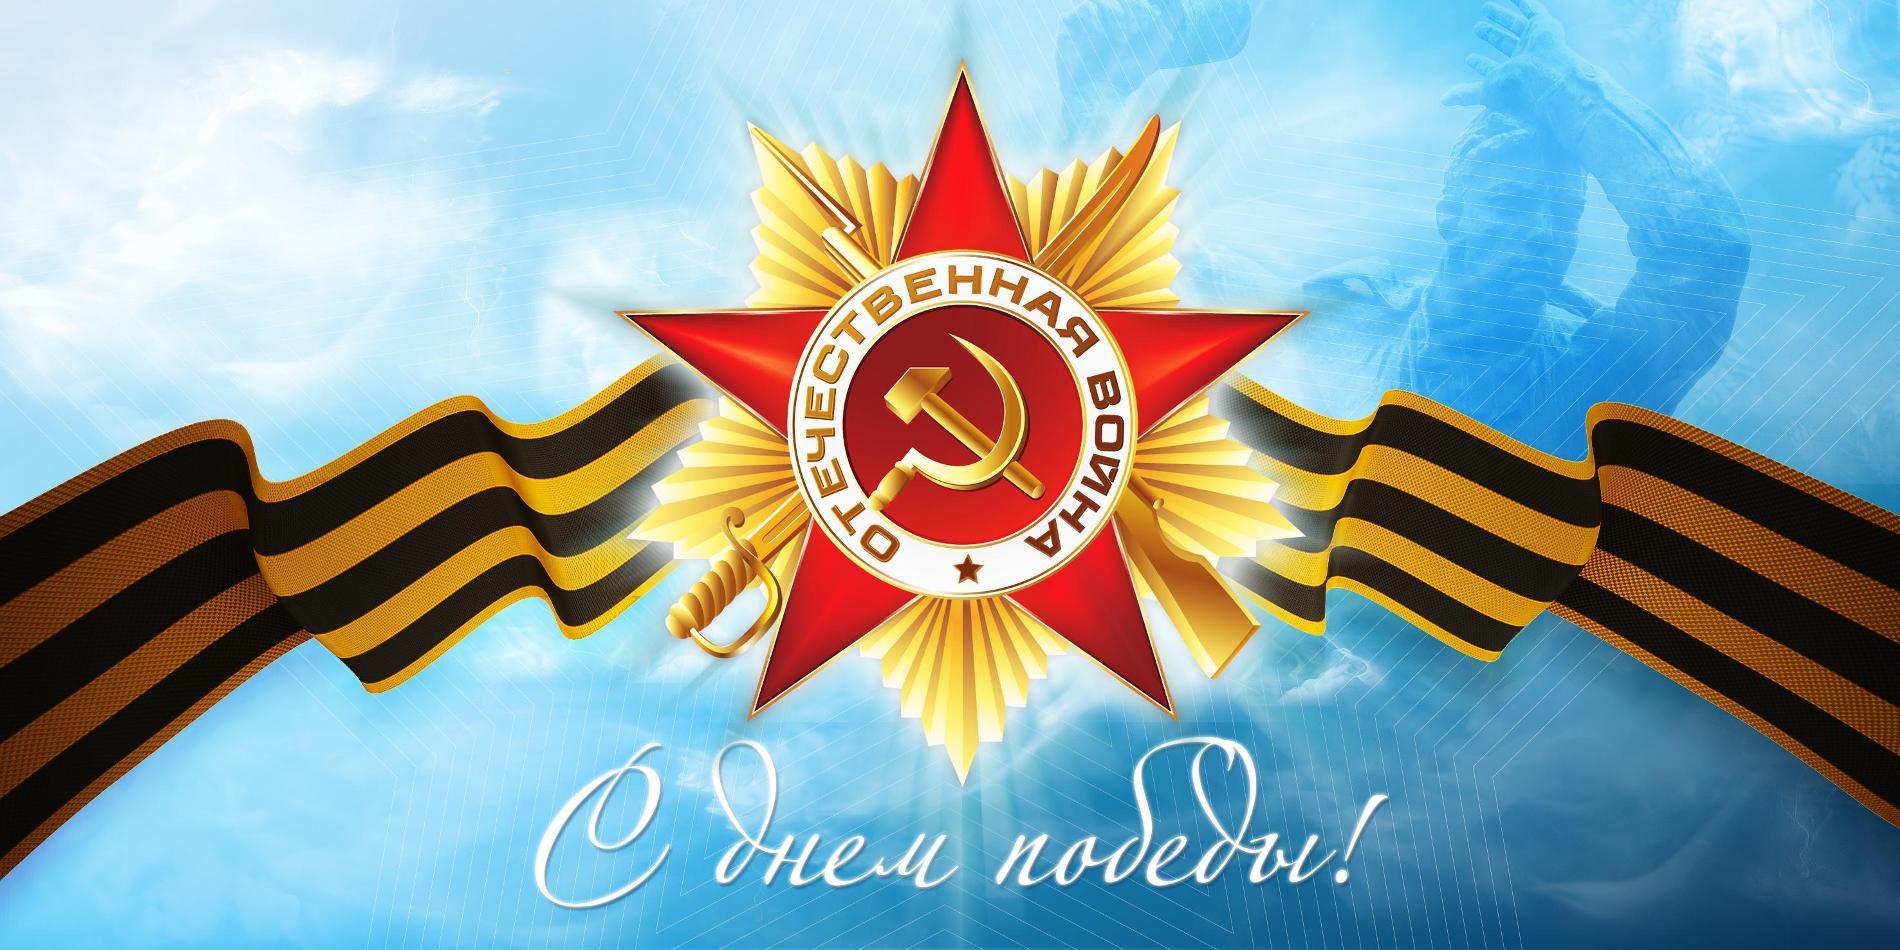 Анонс мероприятий на 9 мая | Новости Приднестровья